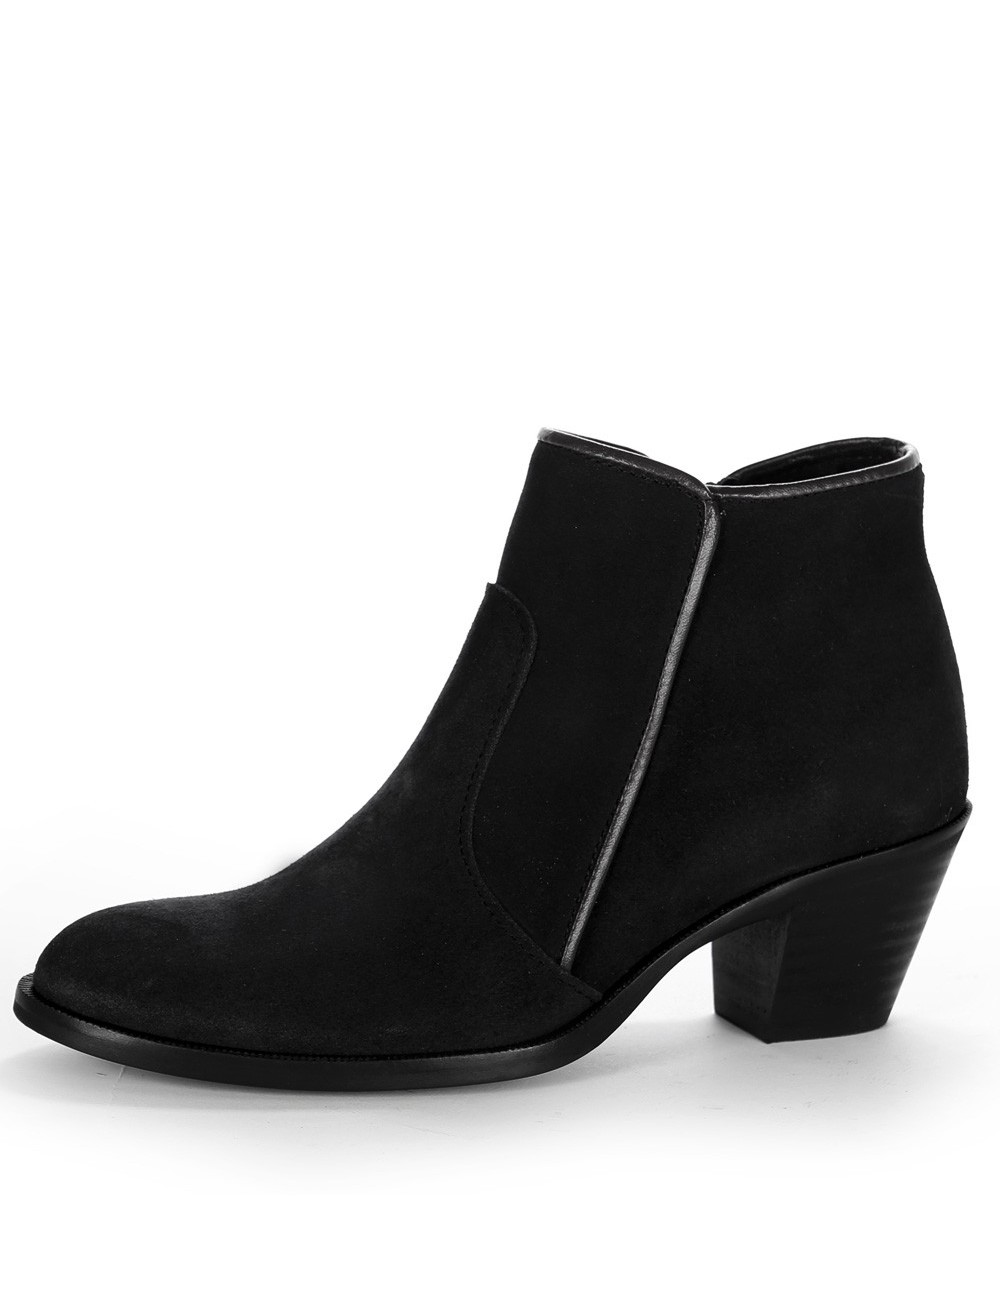 Bottines femme daim noir - bottines femmes artisanales